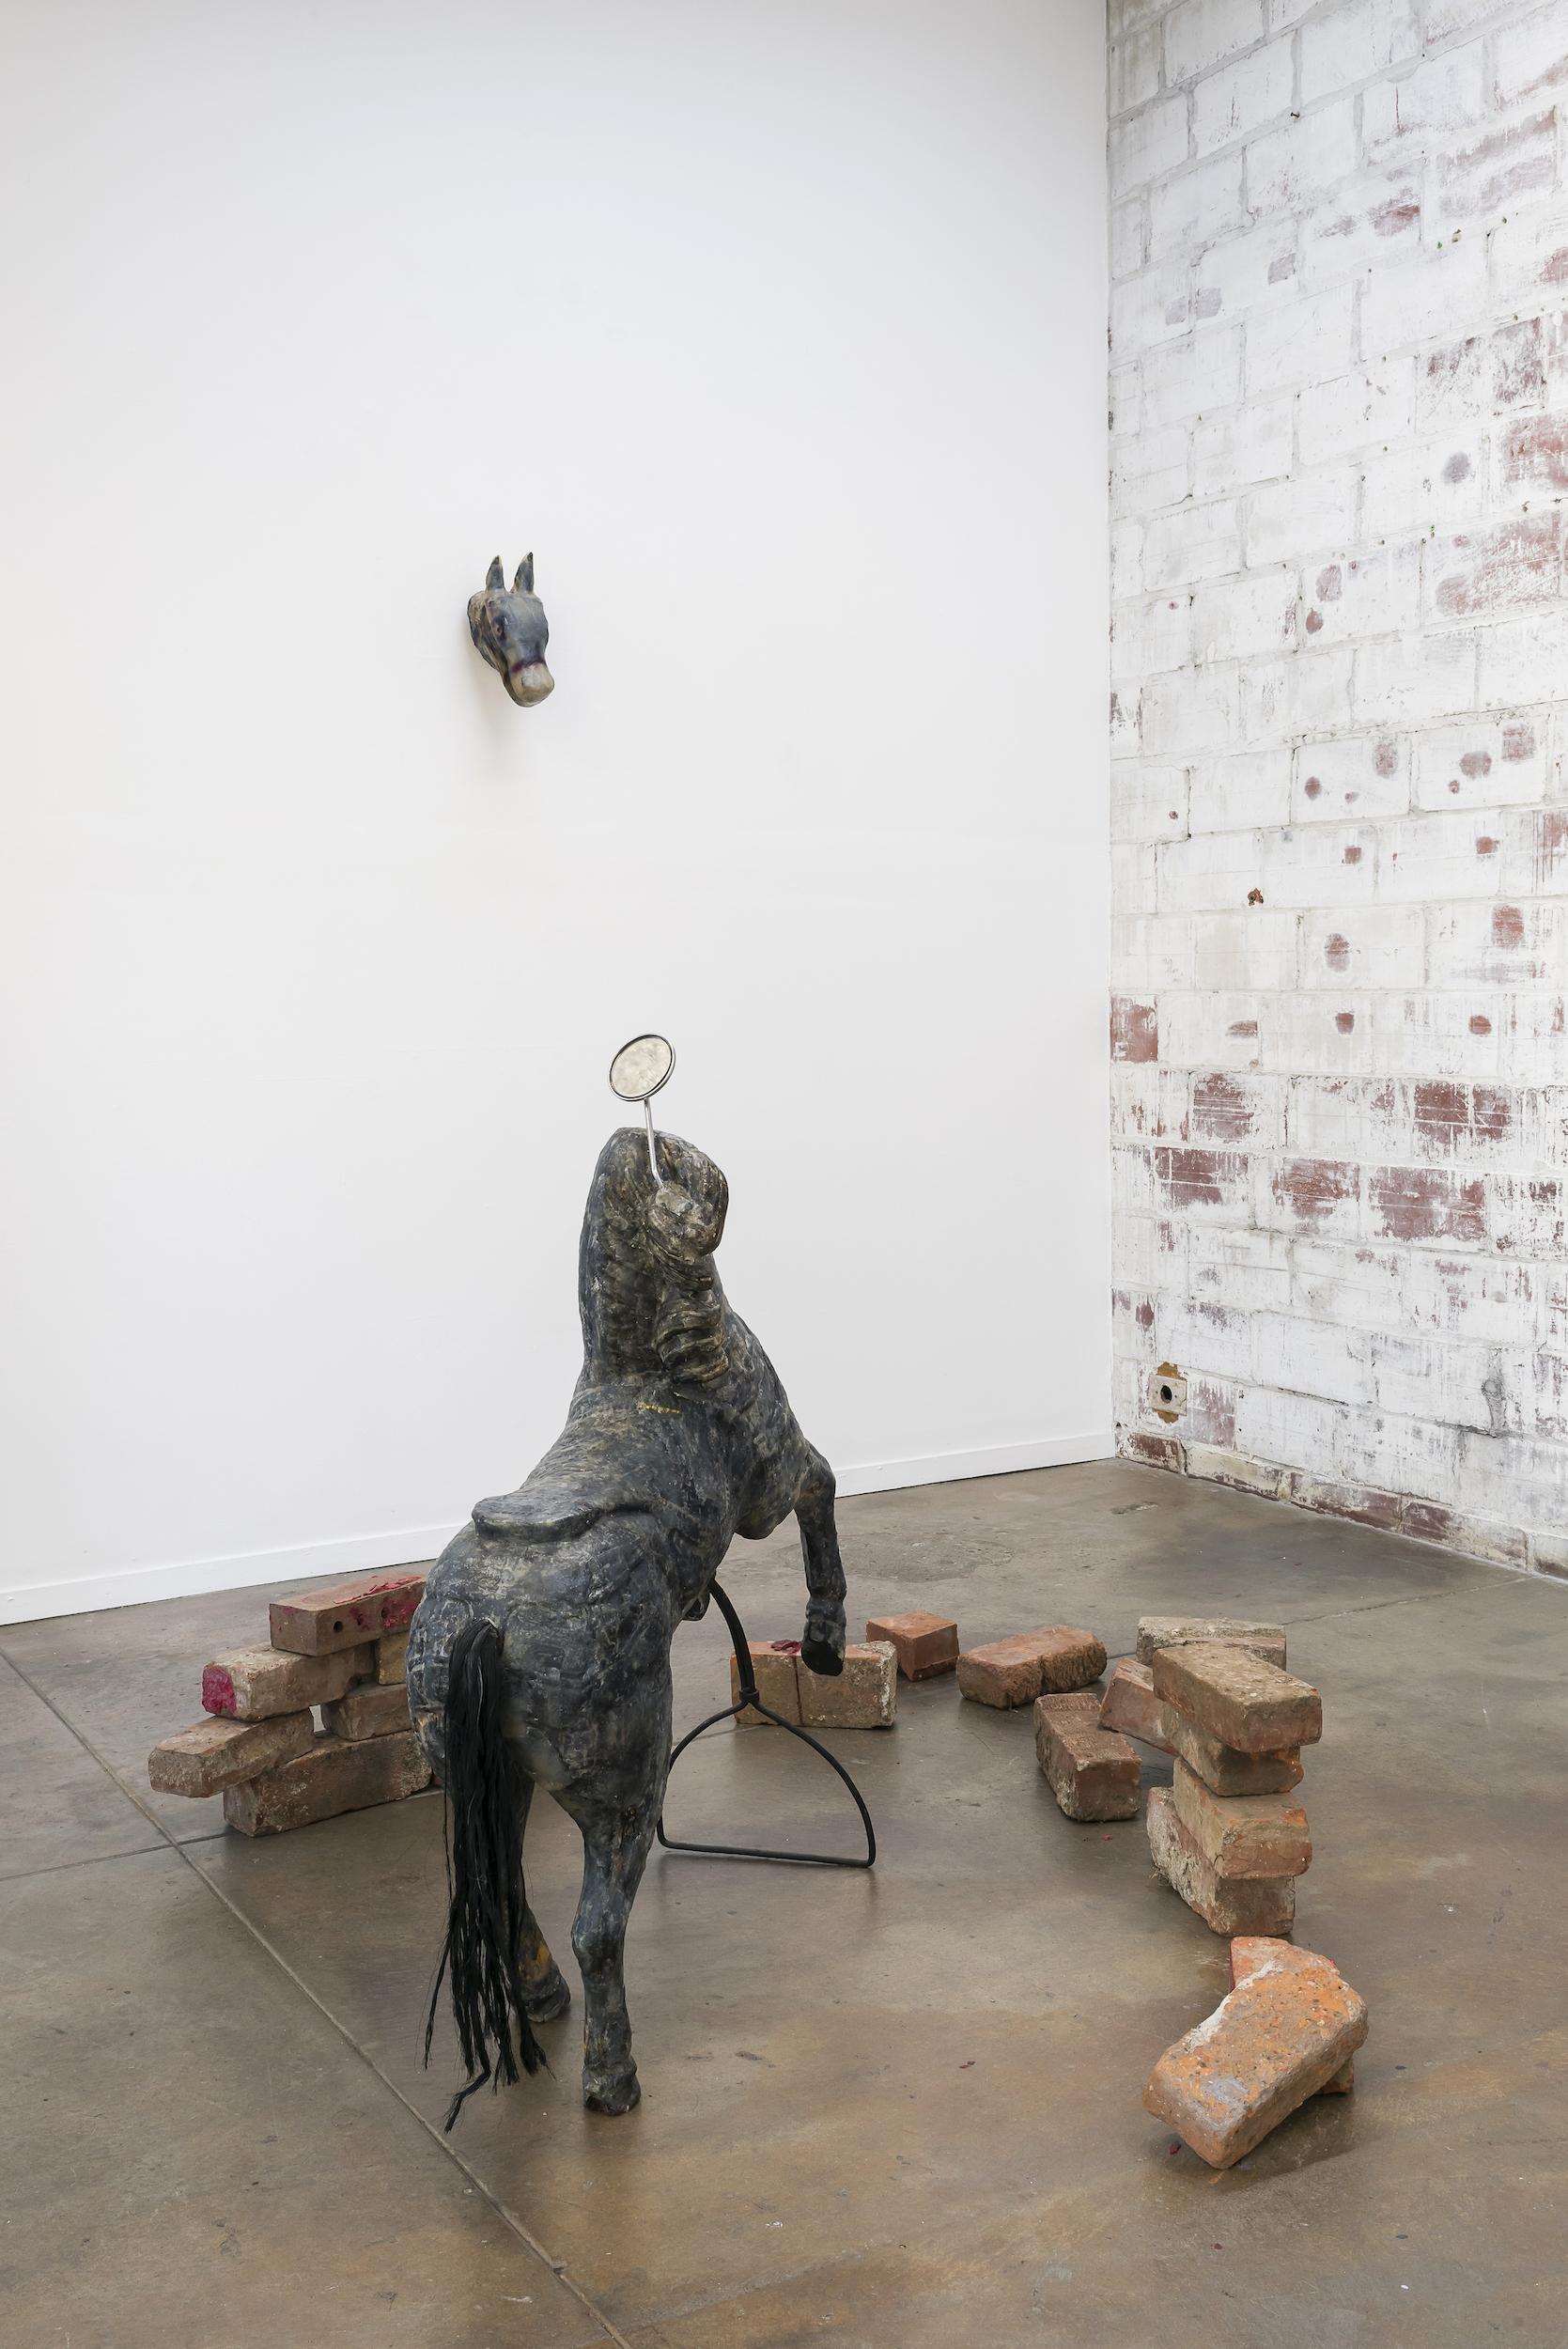 Bri Williams,  Medusa , 2018. Carousel horse, soap, bike mirror, red wax, bricks